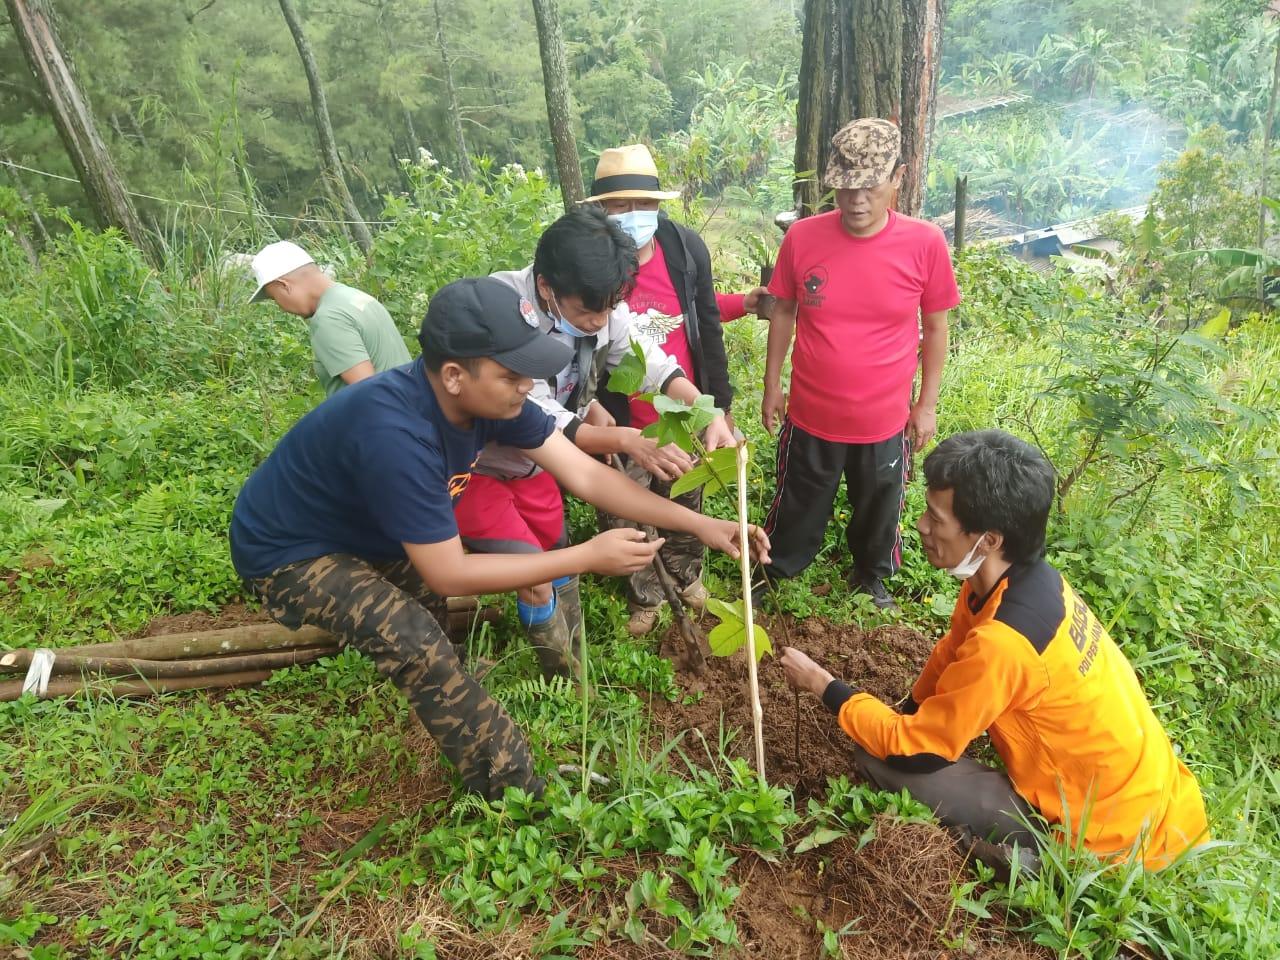 Anggota DPRD Ciamis menanam pohon di Gunung Bangka Sindangkasih Ciamis Jabar (Kayan / Mattanews.co)